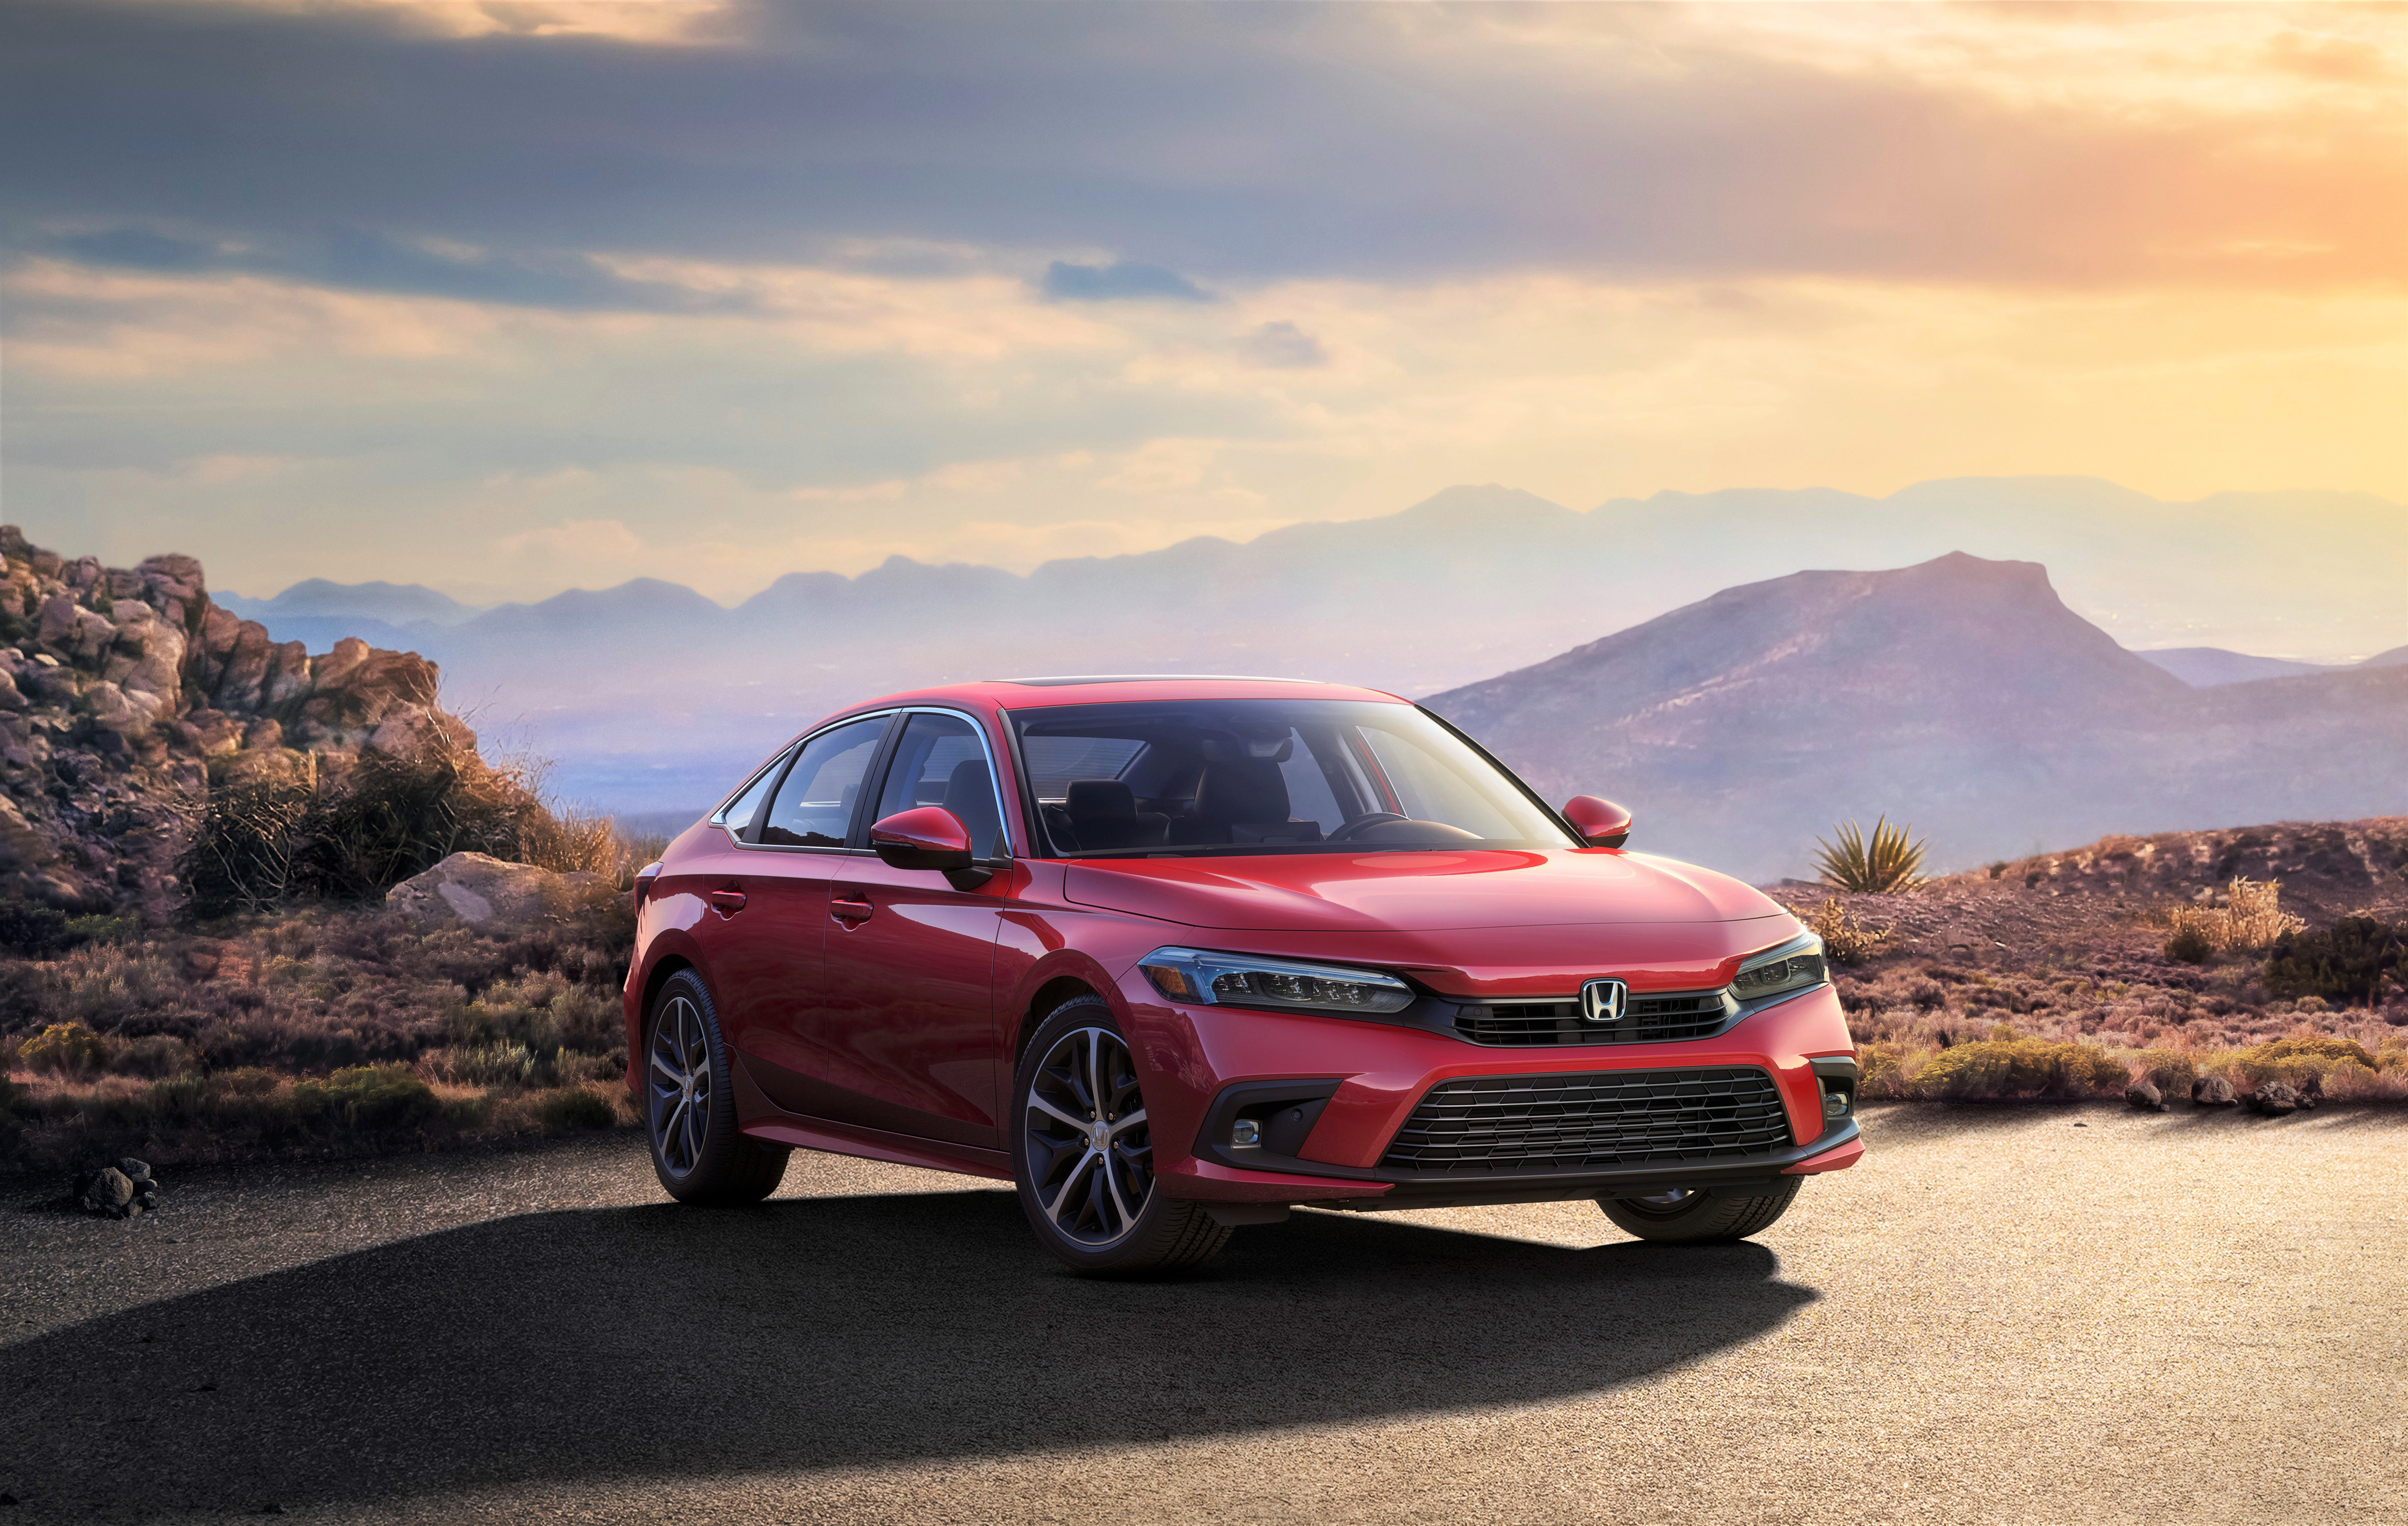 2022 Honda Civic: Honda redesigns compact car